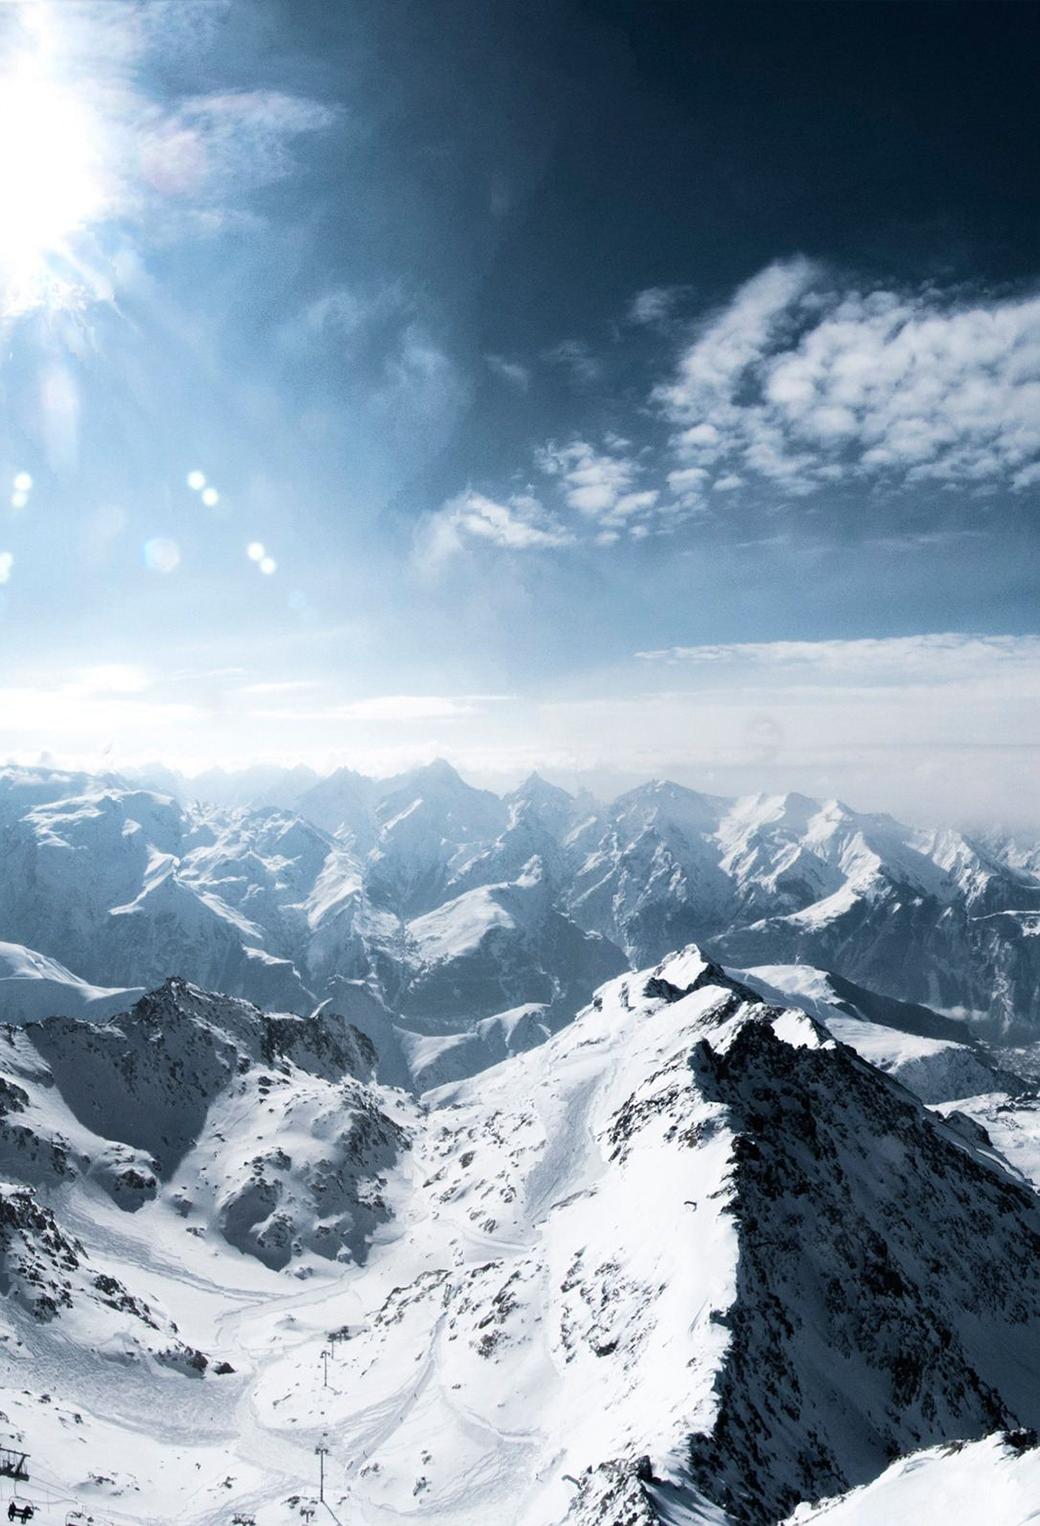 Mountain Snow 3Wallpapers iPhone Paralalx Mountain Snow